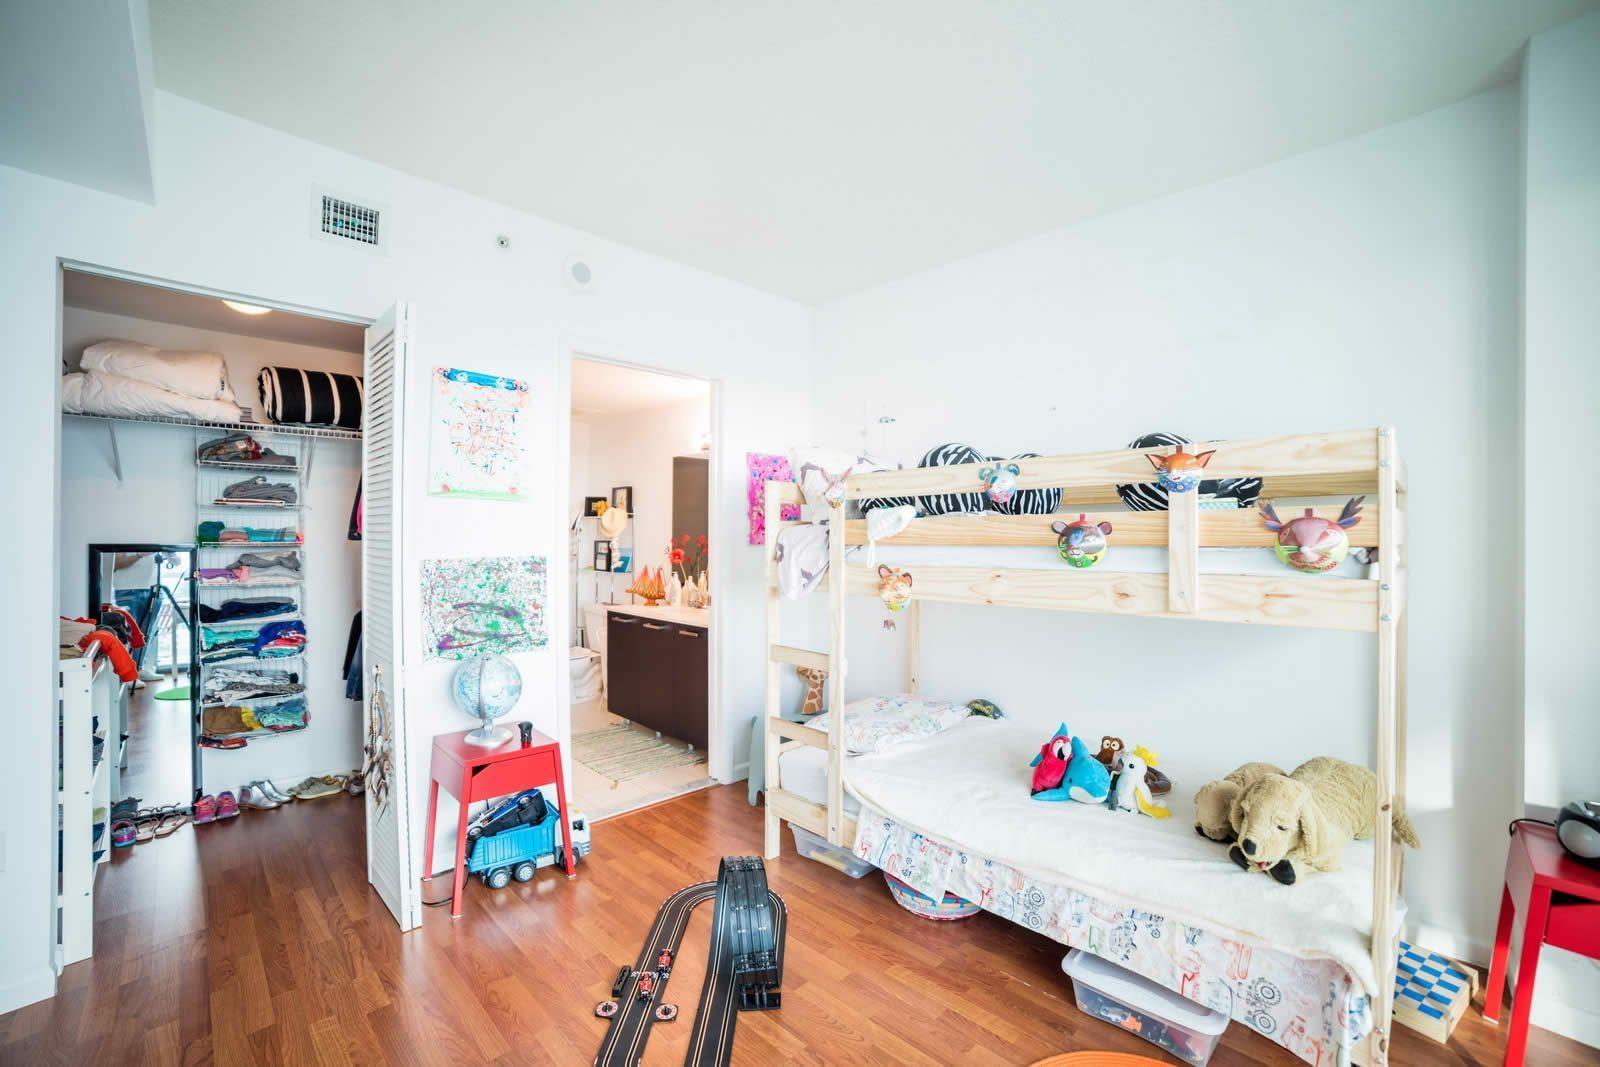 appartement-piscine-salle-de-sport-sauna-a-vendre-edgewater-wynwood